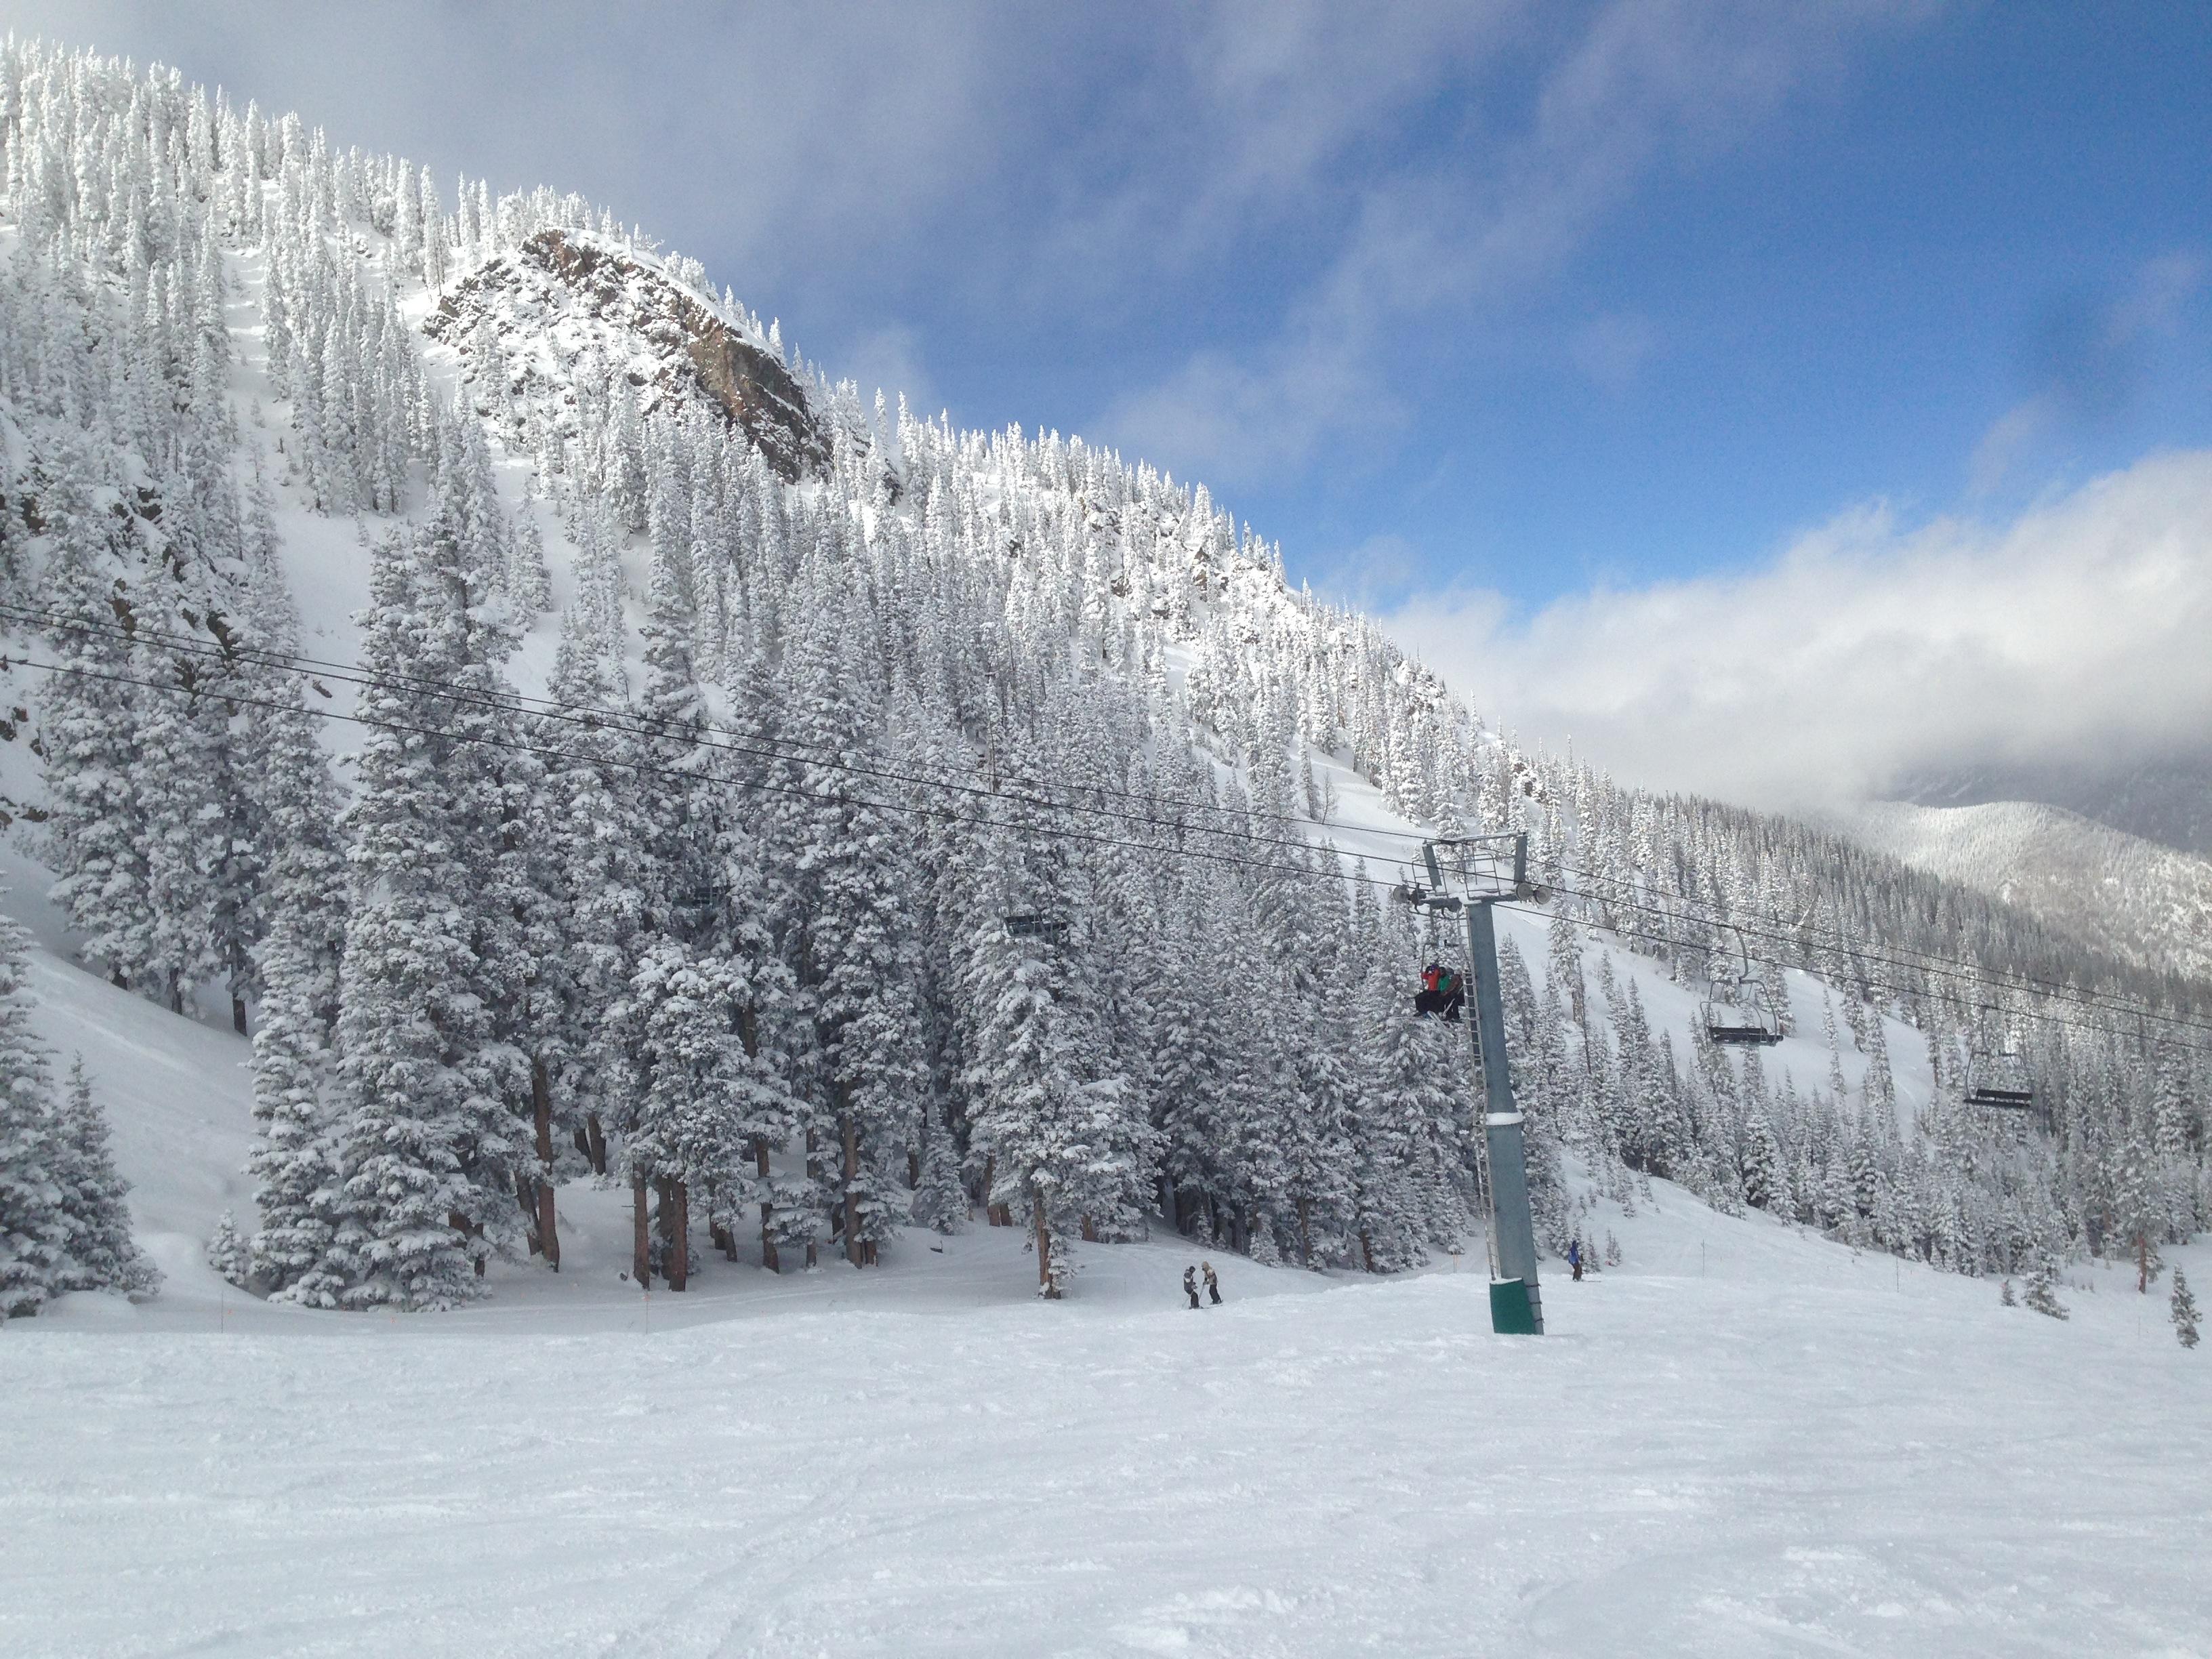 Taos ski area avalanche